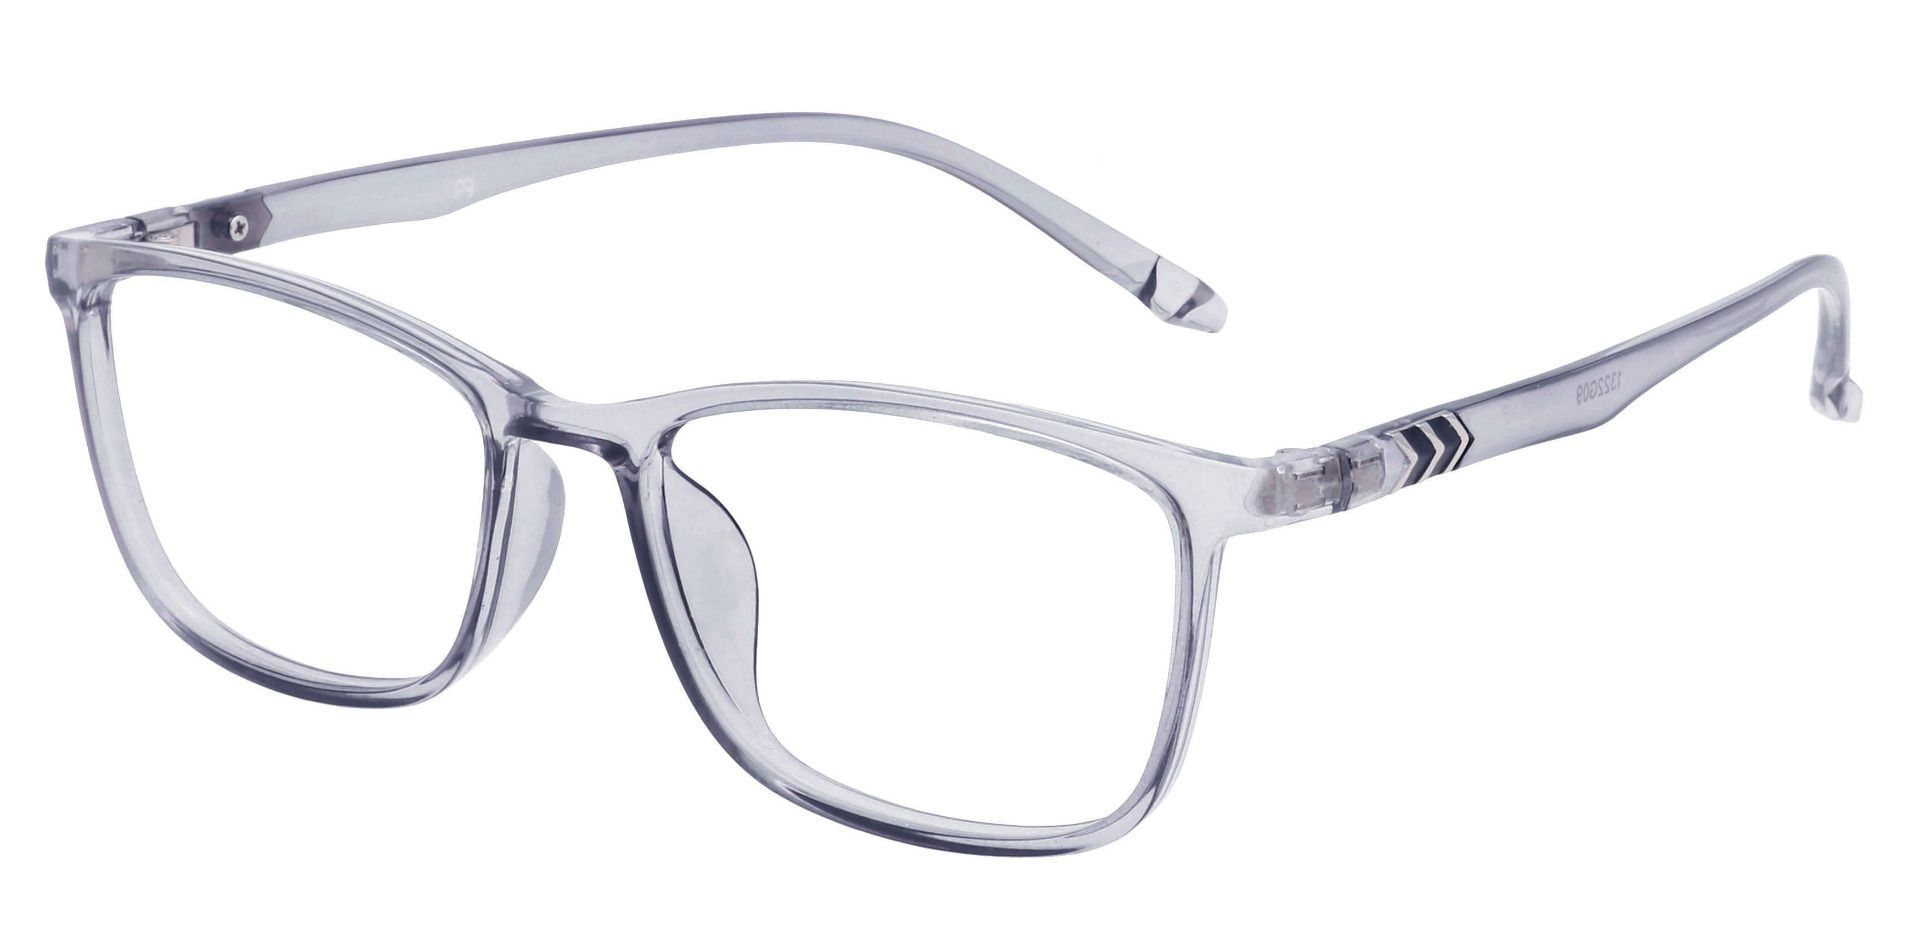 Harvest Rectangle Prescription Glasses - Gray